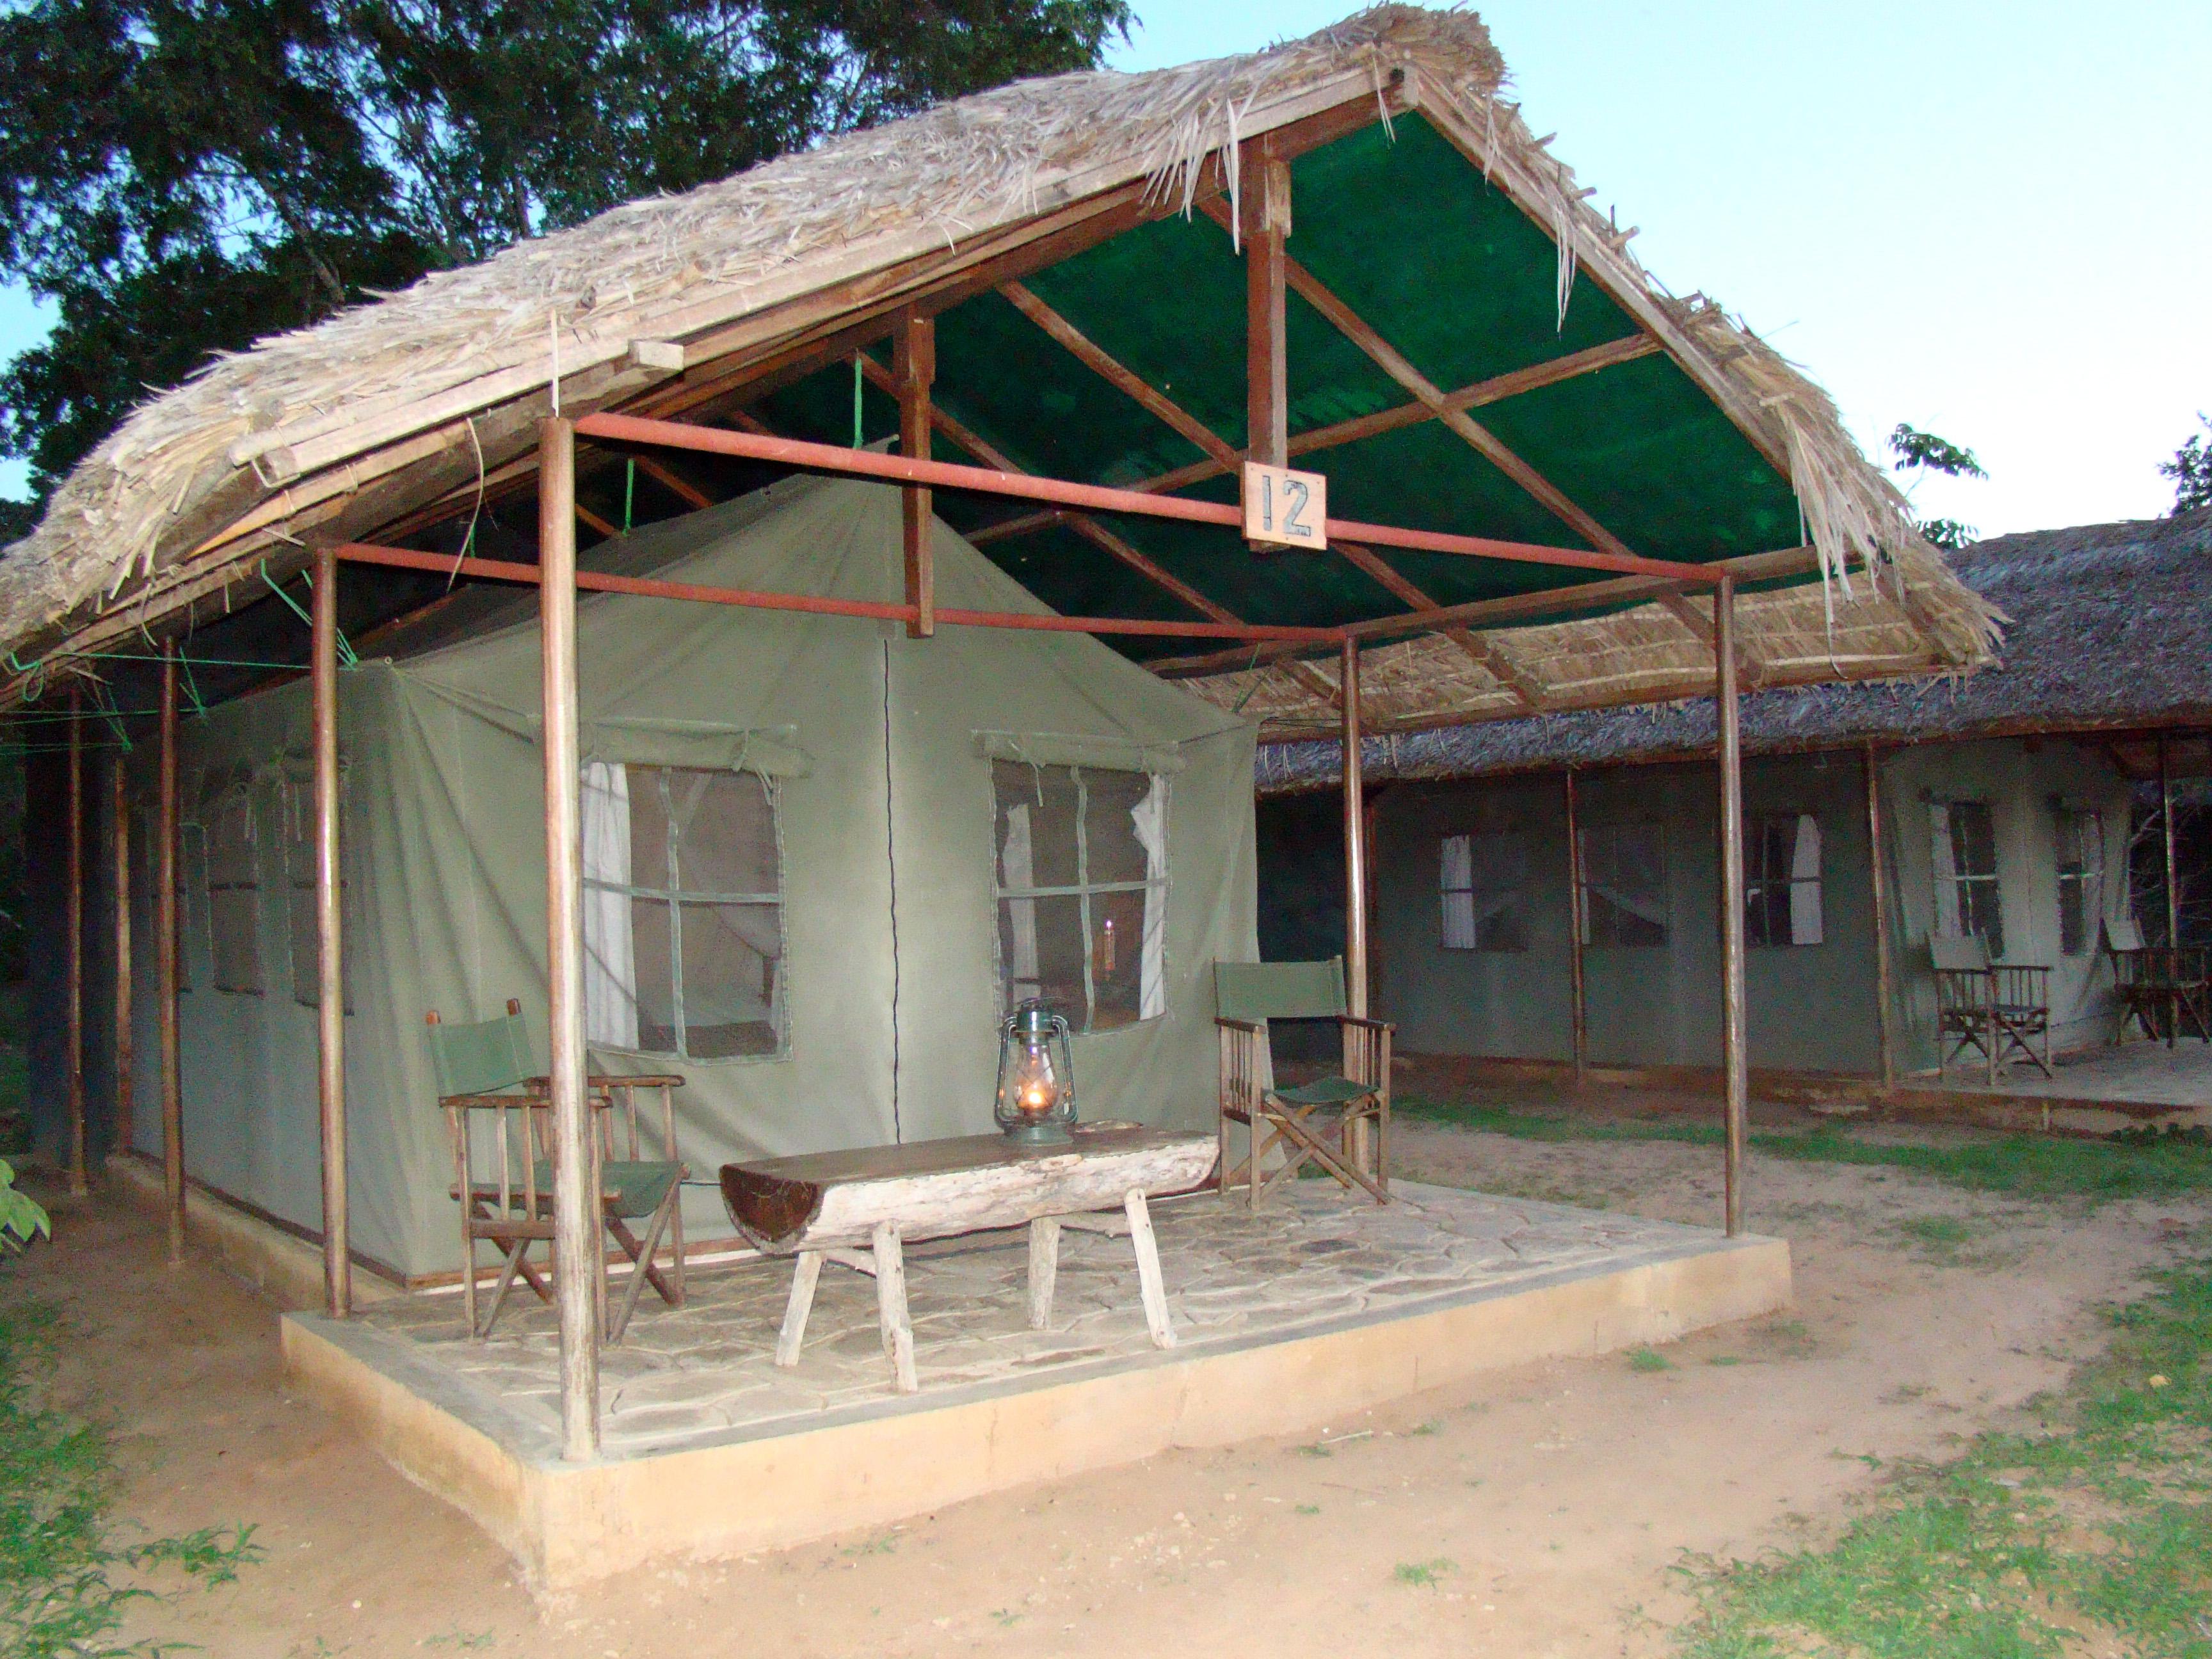 File:TZ Selous Rufiji River Camp JPG - Wikimedia Commons